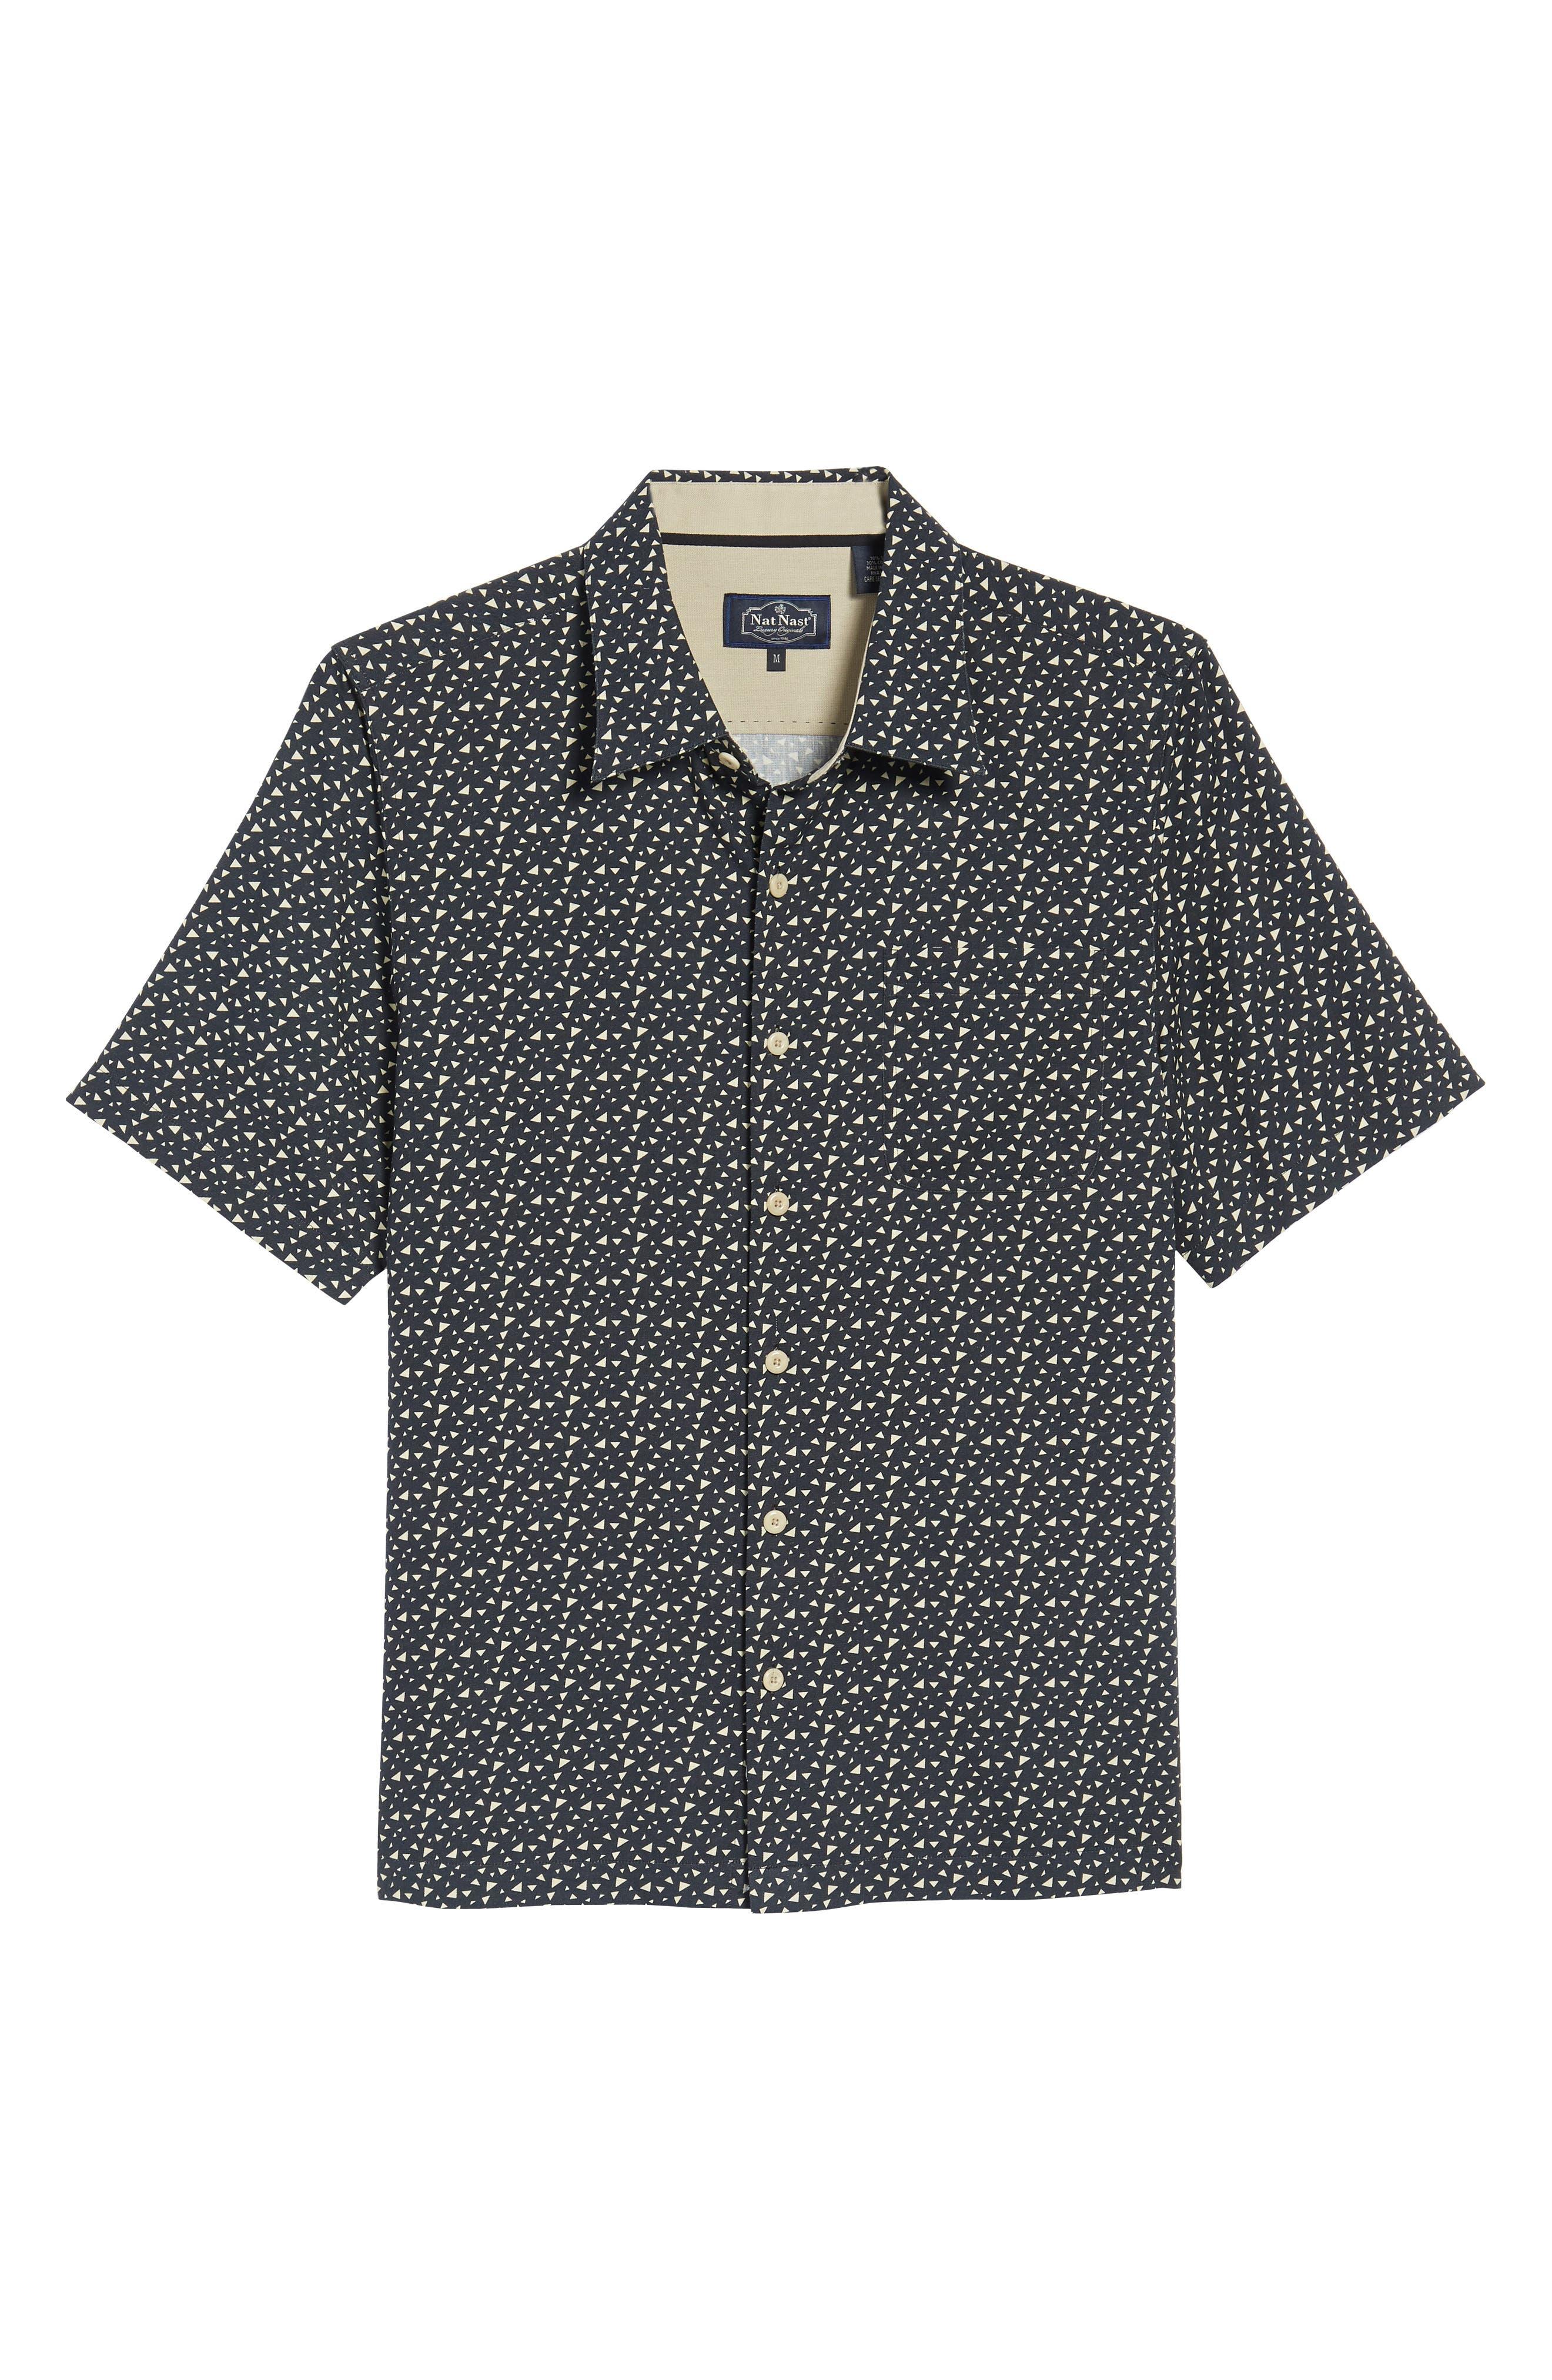 NAT NAST,                             Bermuda Triangle Camp Shirt,                             Alternate thumbnail 6, color,                             001